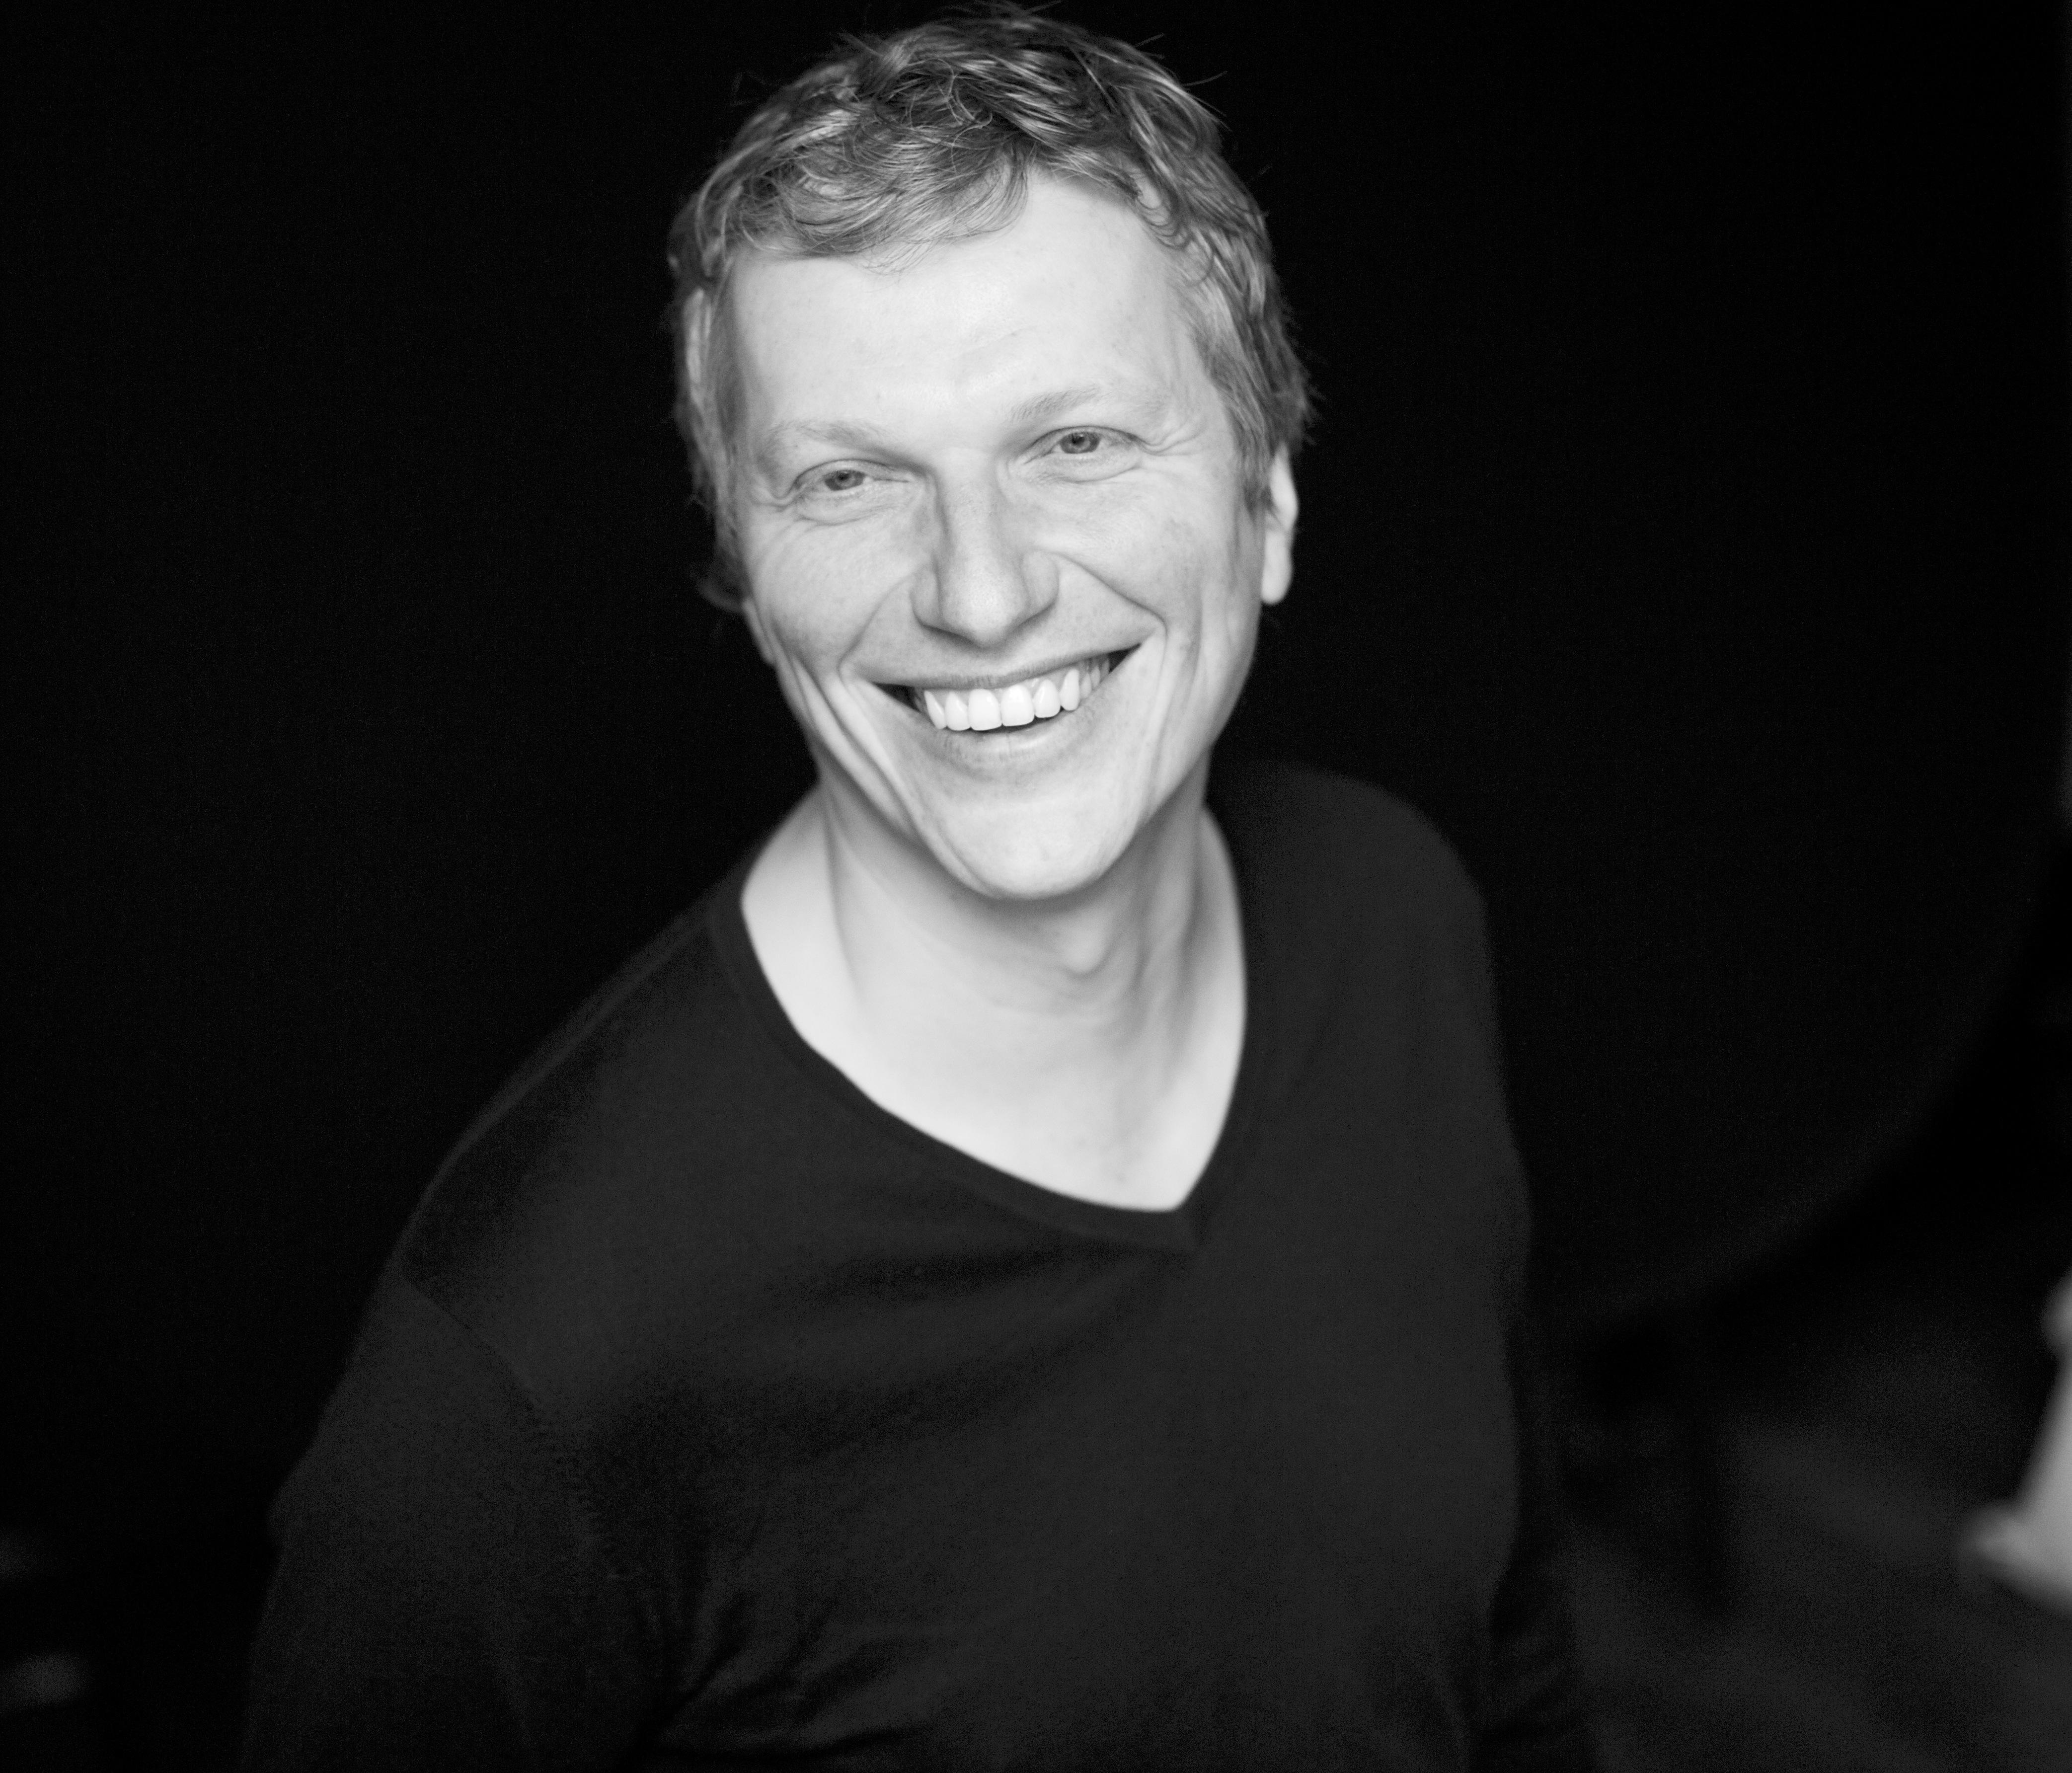 Joseph Dumoulin